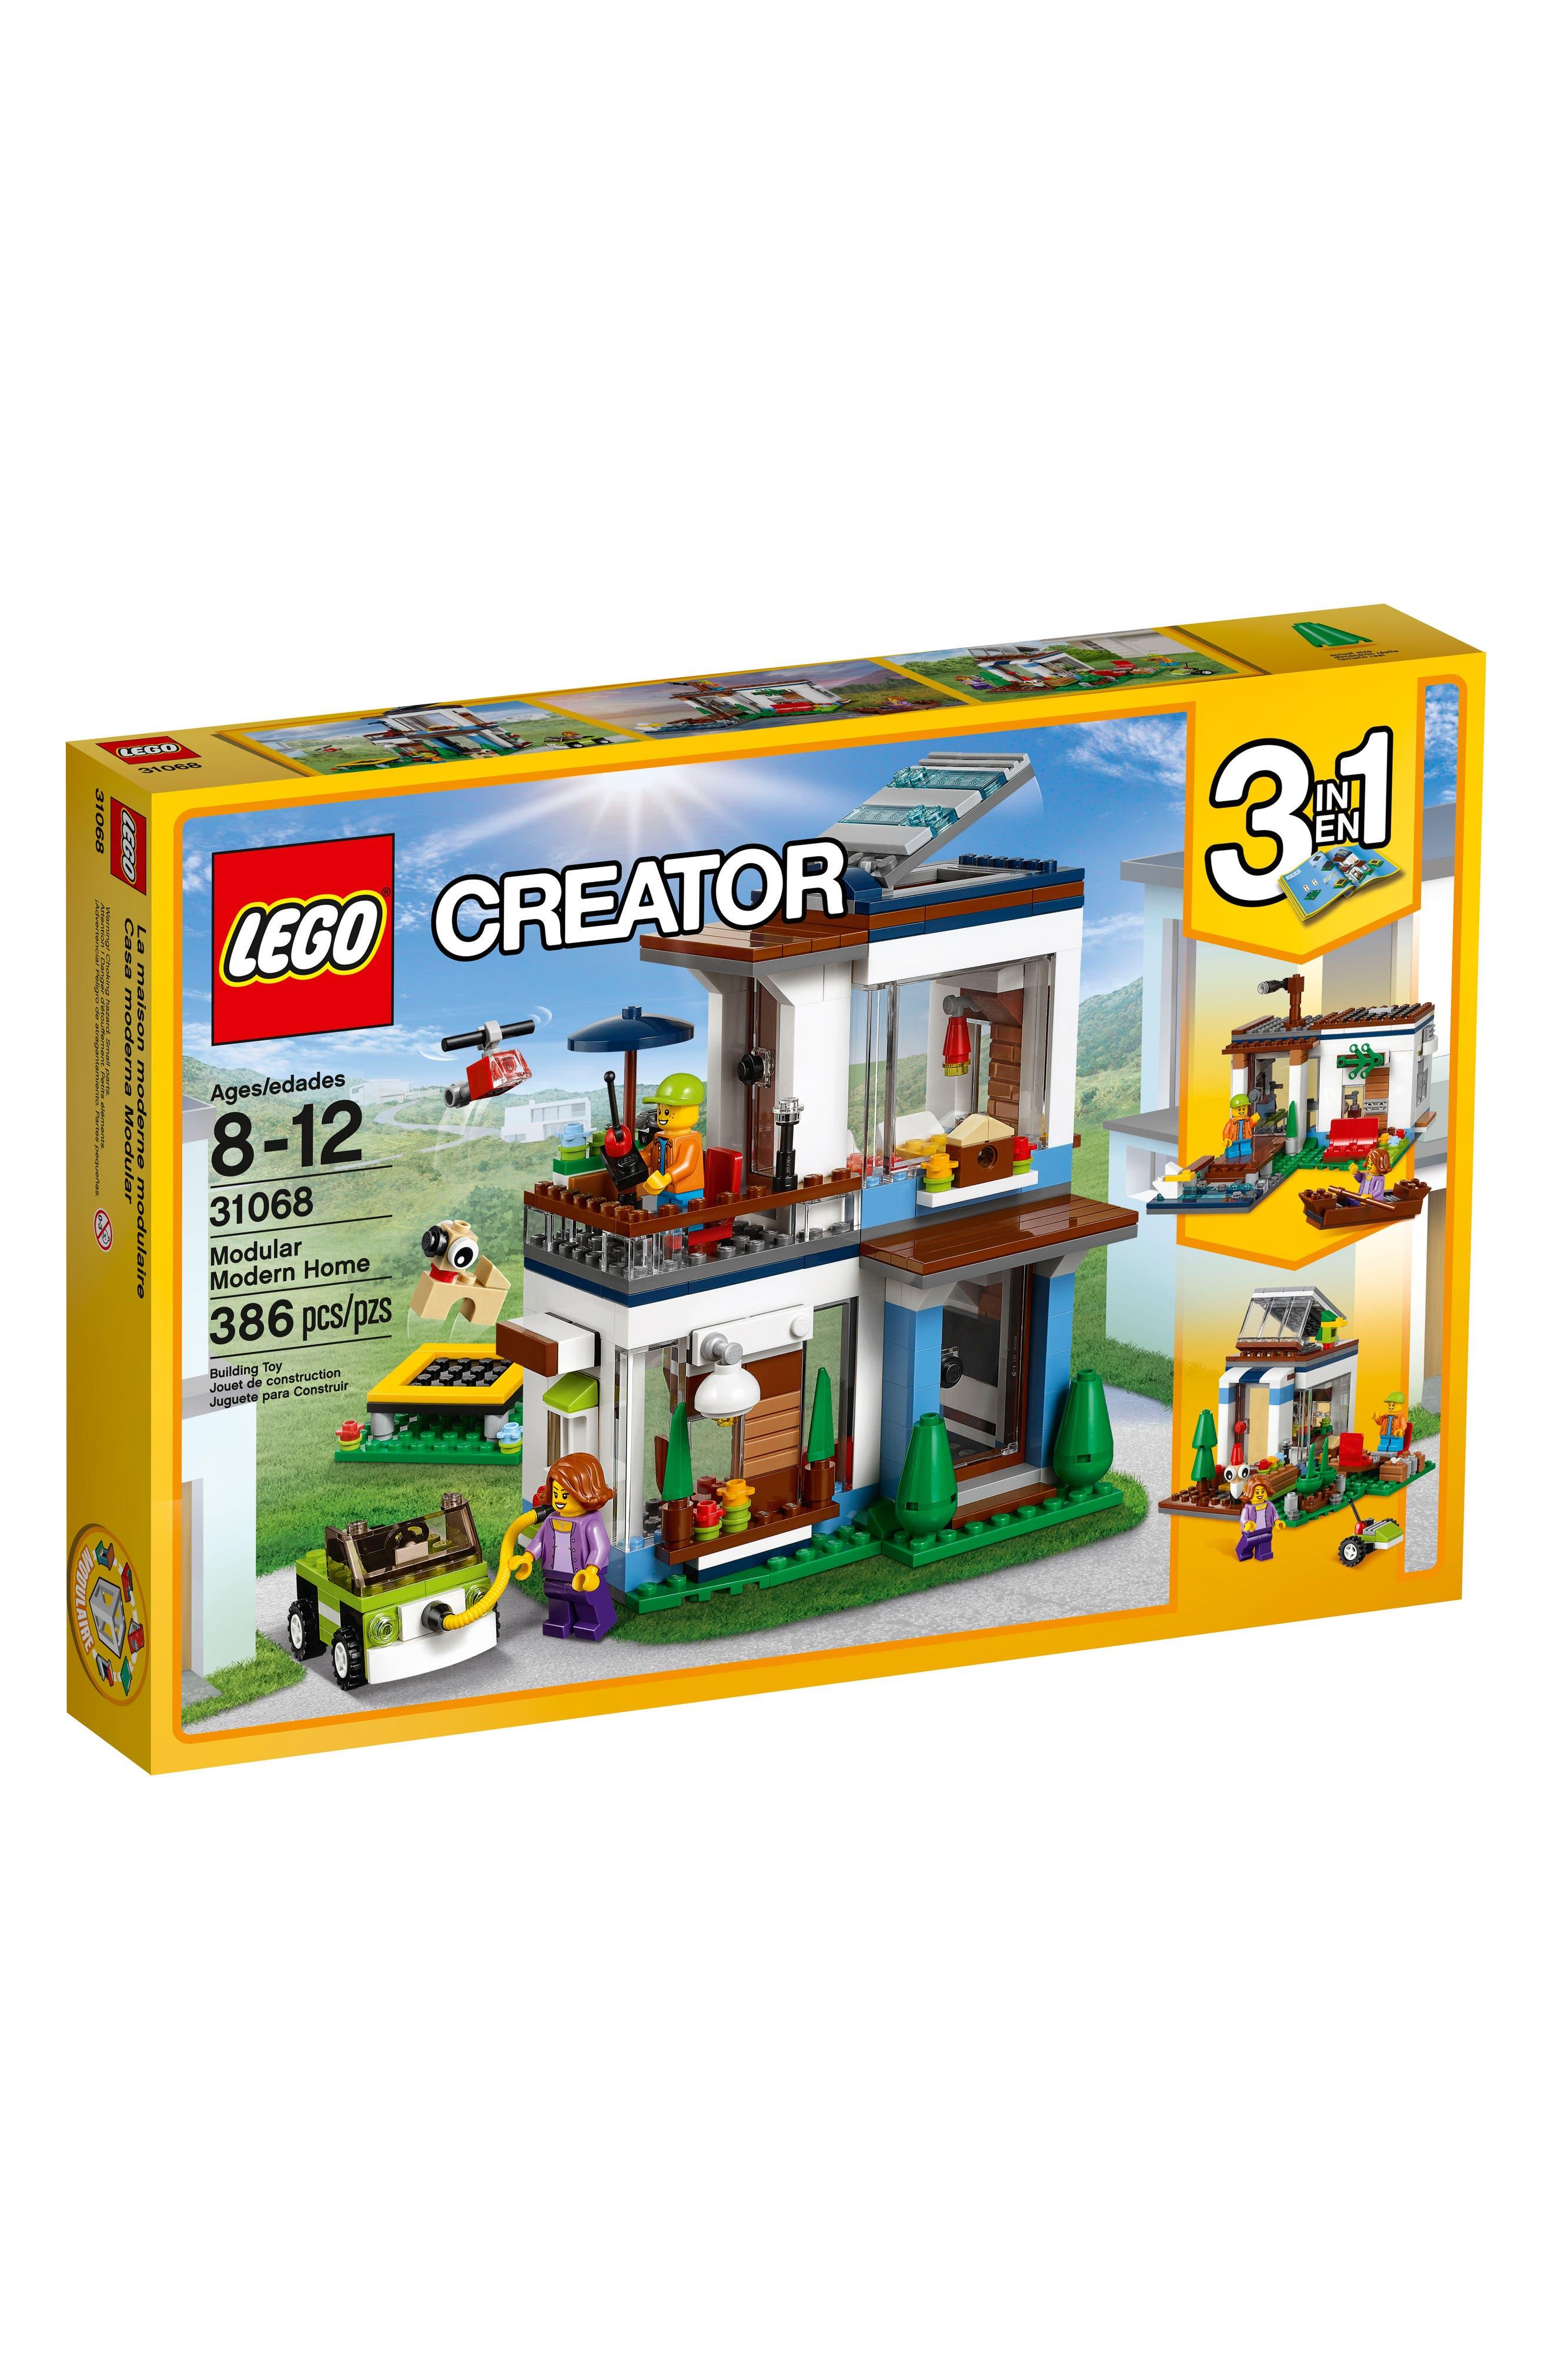 LEGO® Creator 3-in-1 Modular Modern Home Play Set - 31068